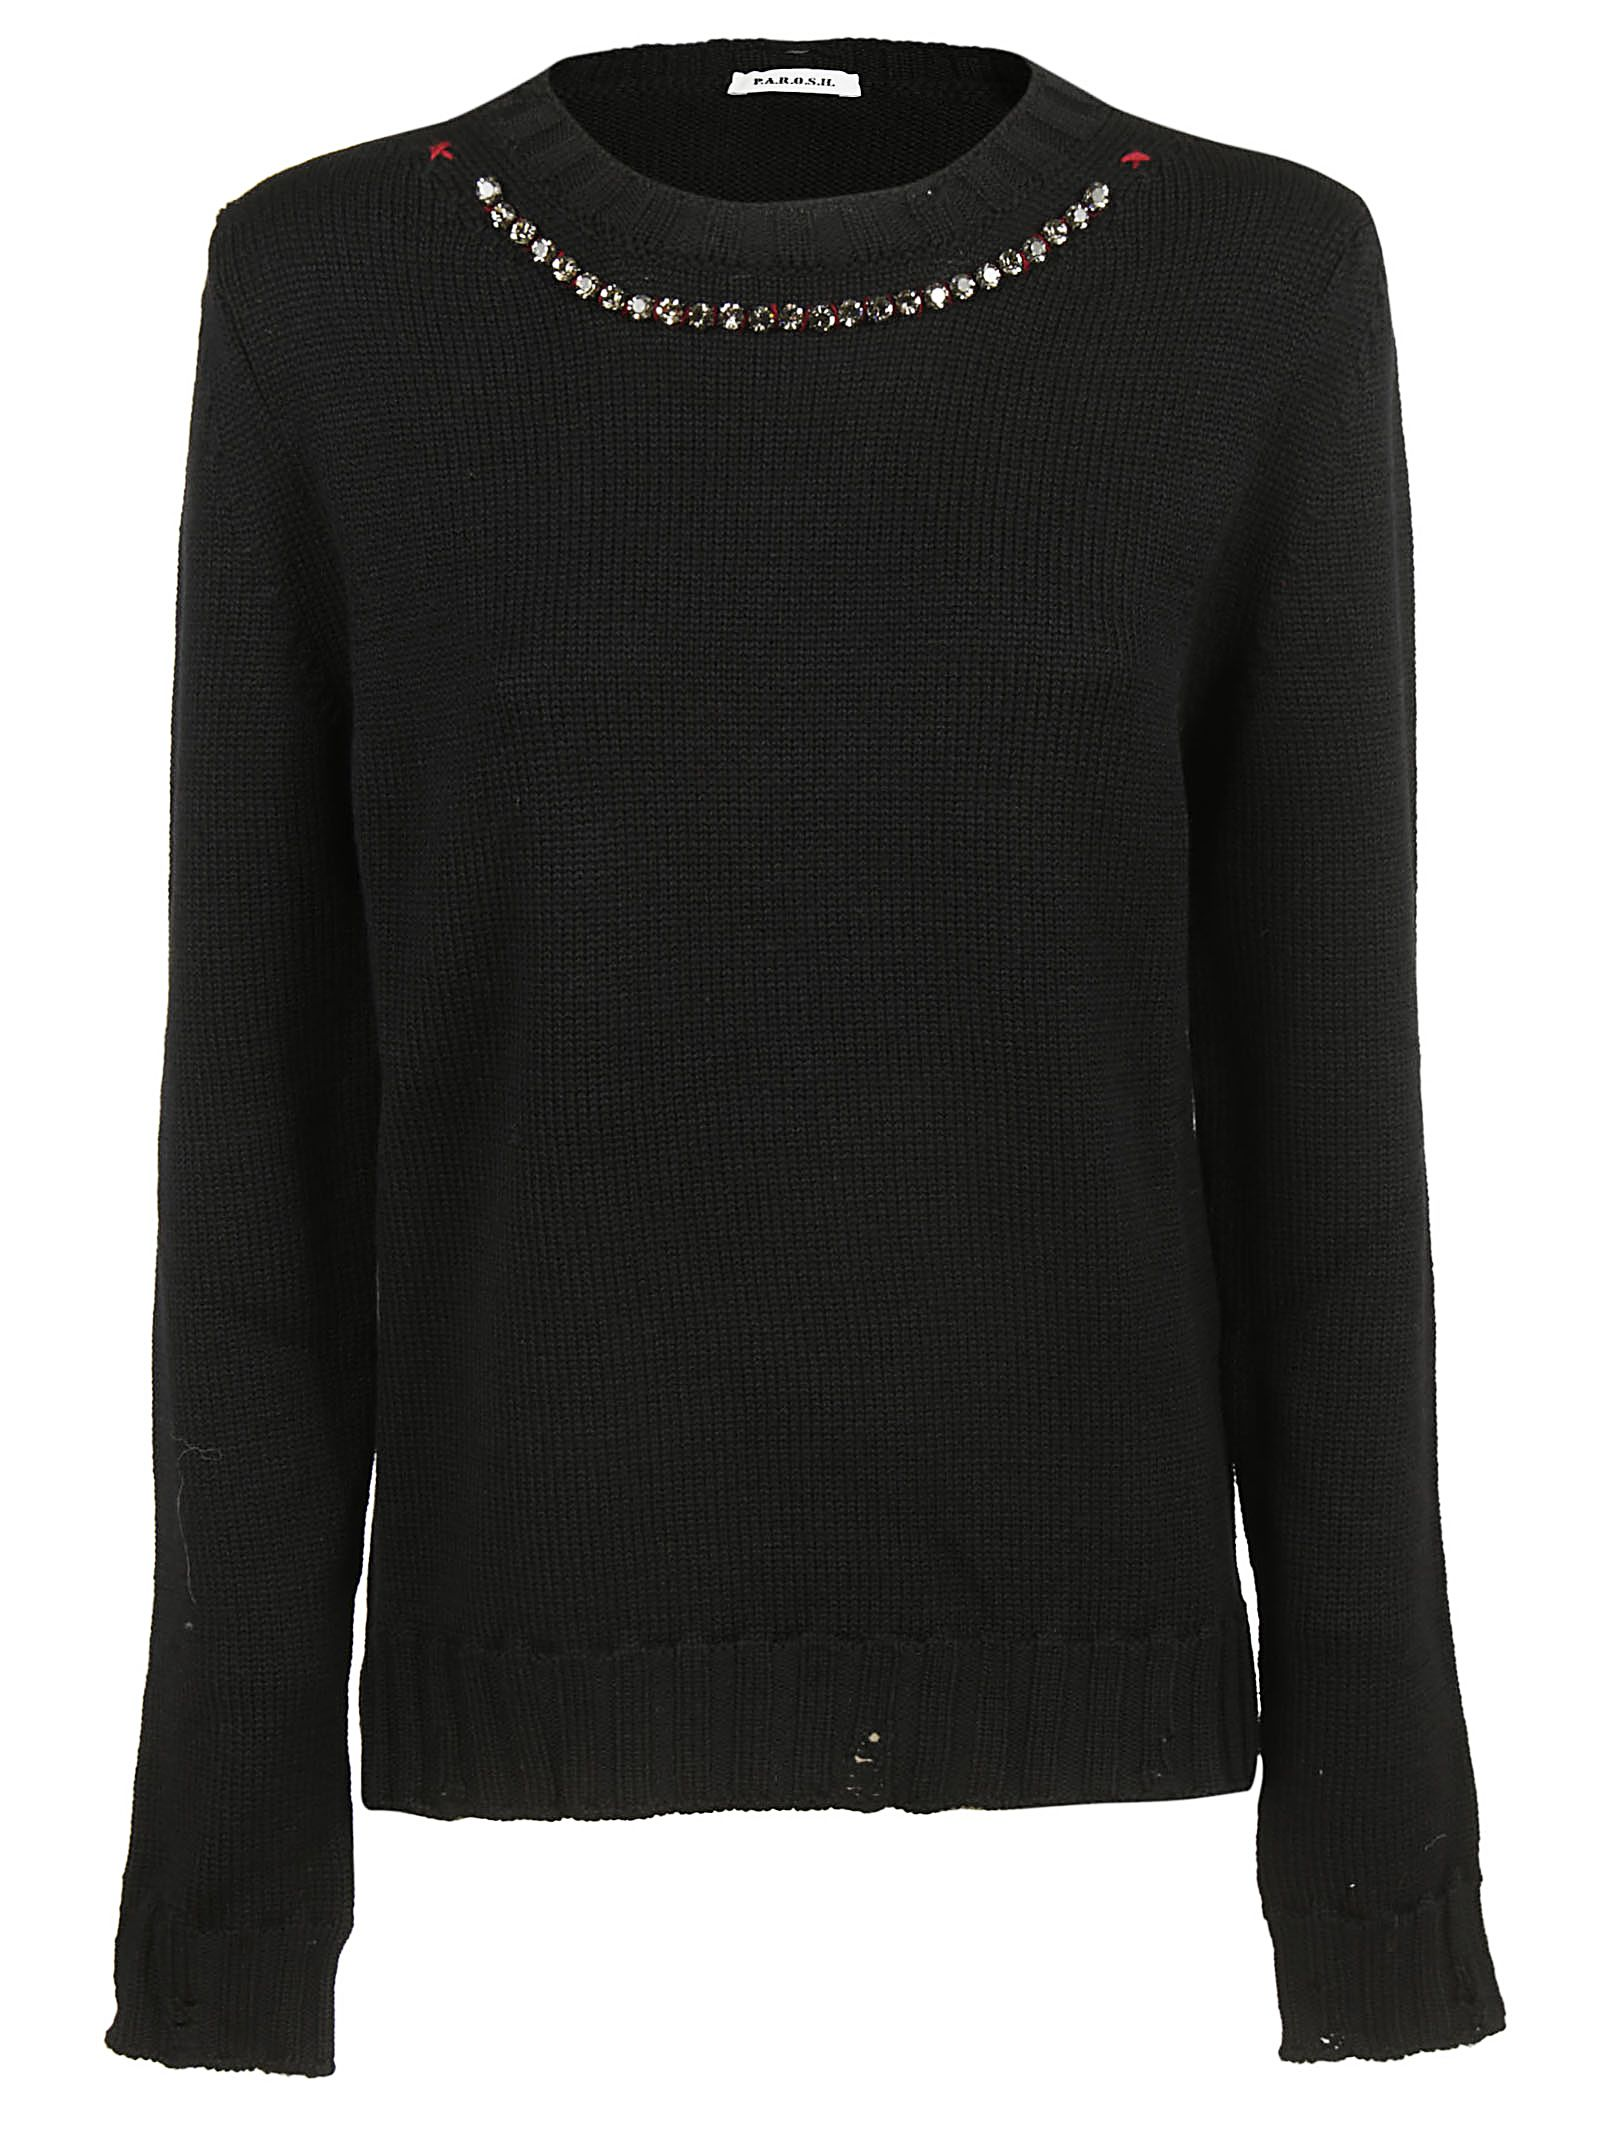 Parosh Embellished Sweater